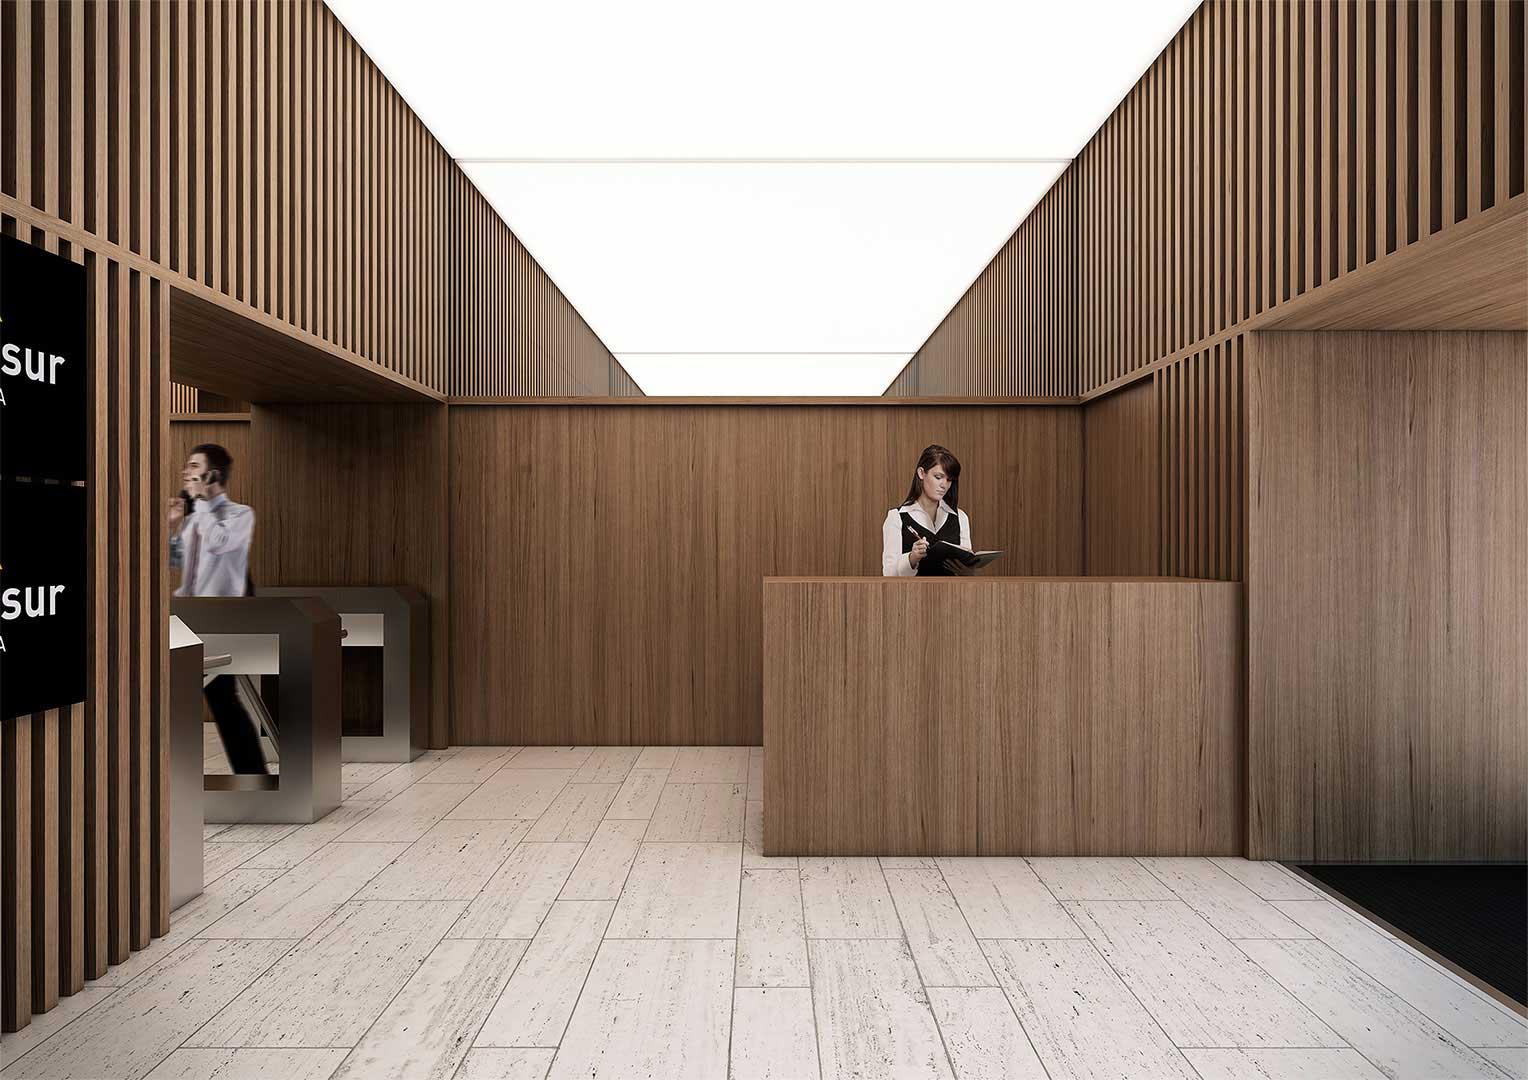 Infograf as 3d para el edificio eurocom m laga lvaro cappa for Diseno de edificios